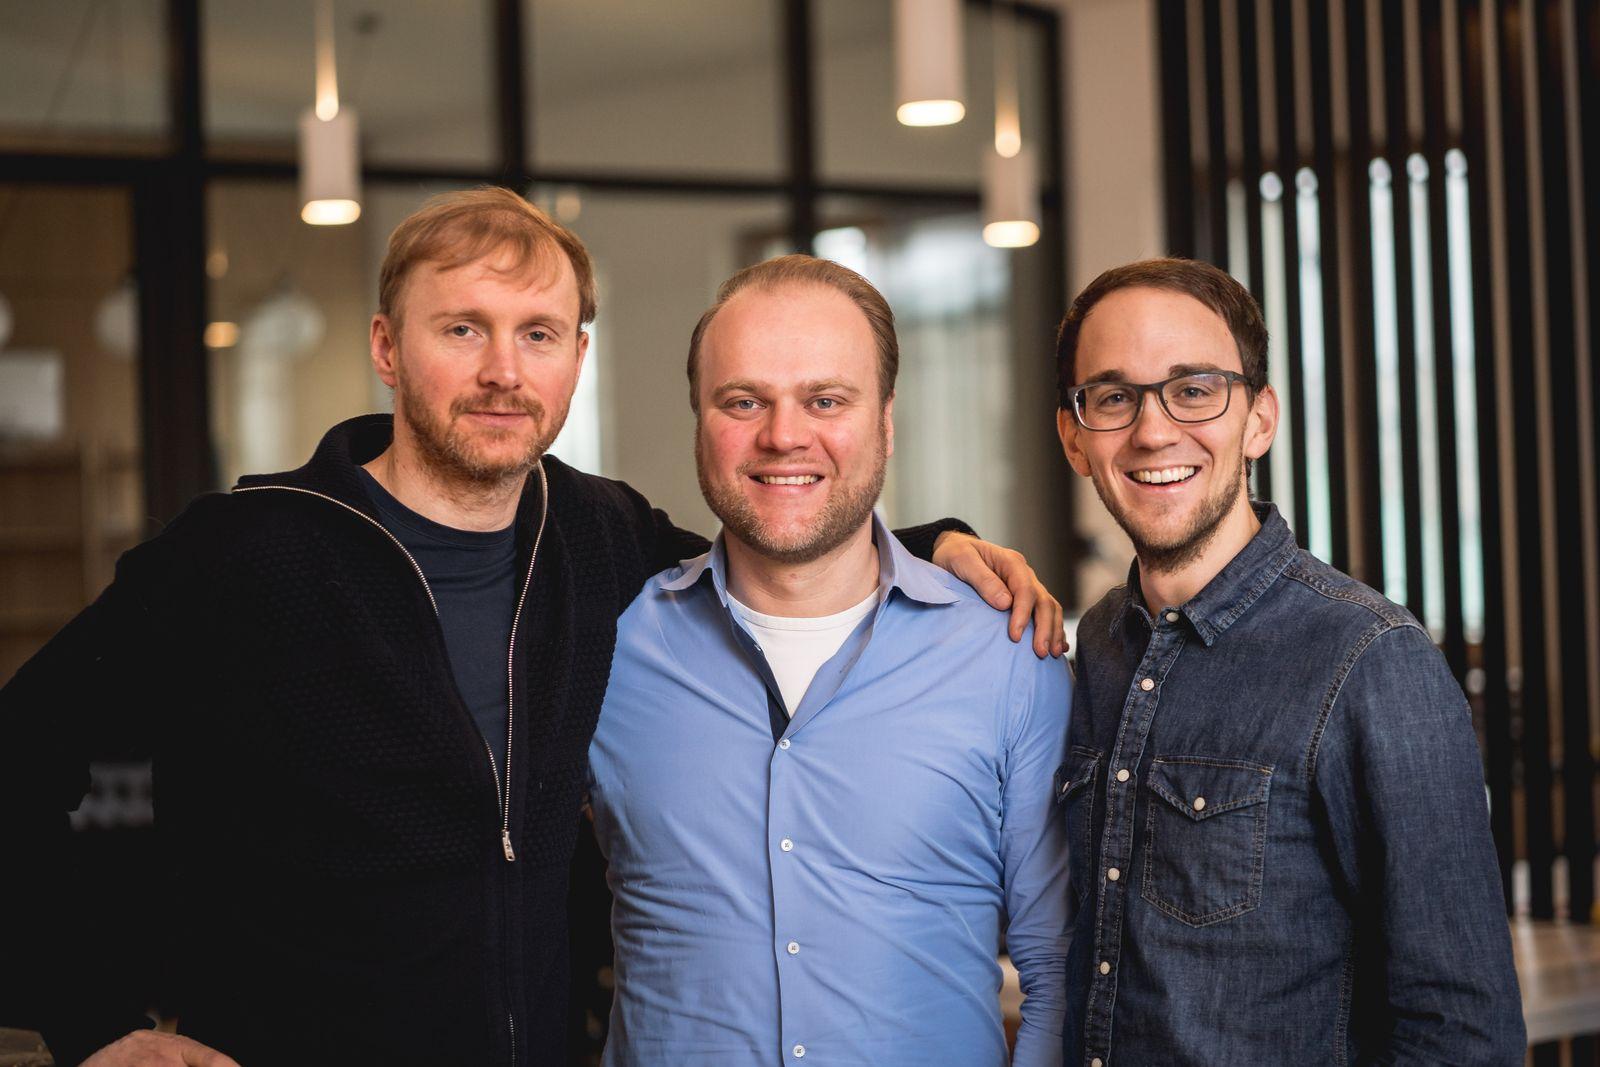 flash-team / Lukasz Gadowski / Christian / Markus